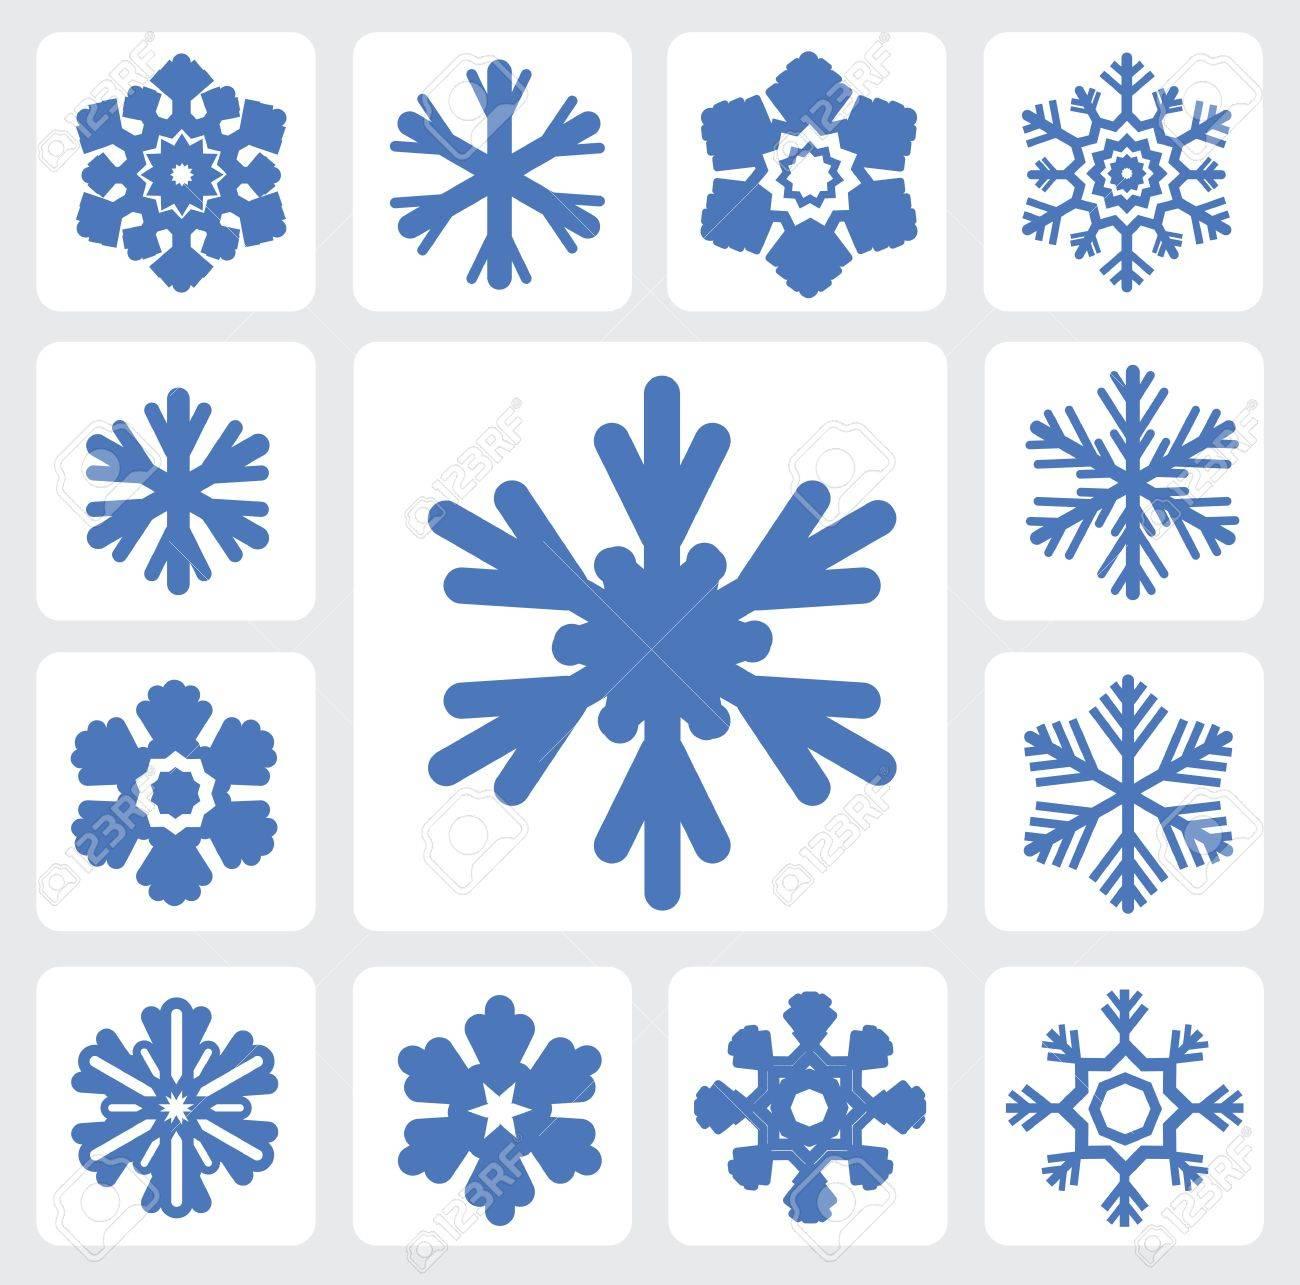 Snowflakes icon Stock Vector - 16135423